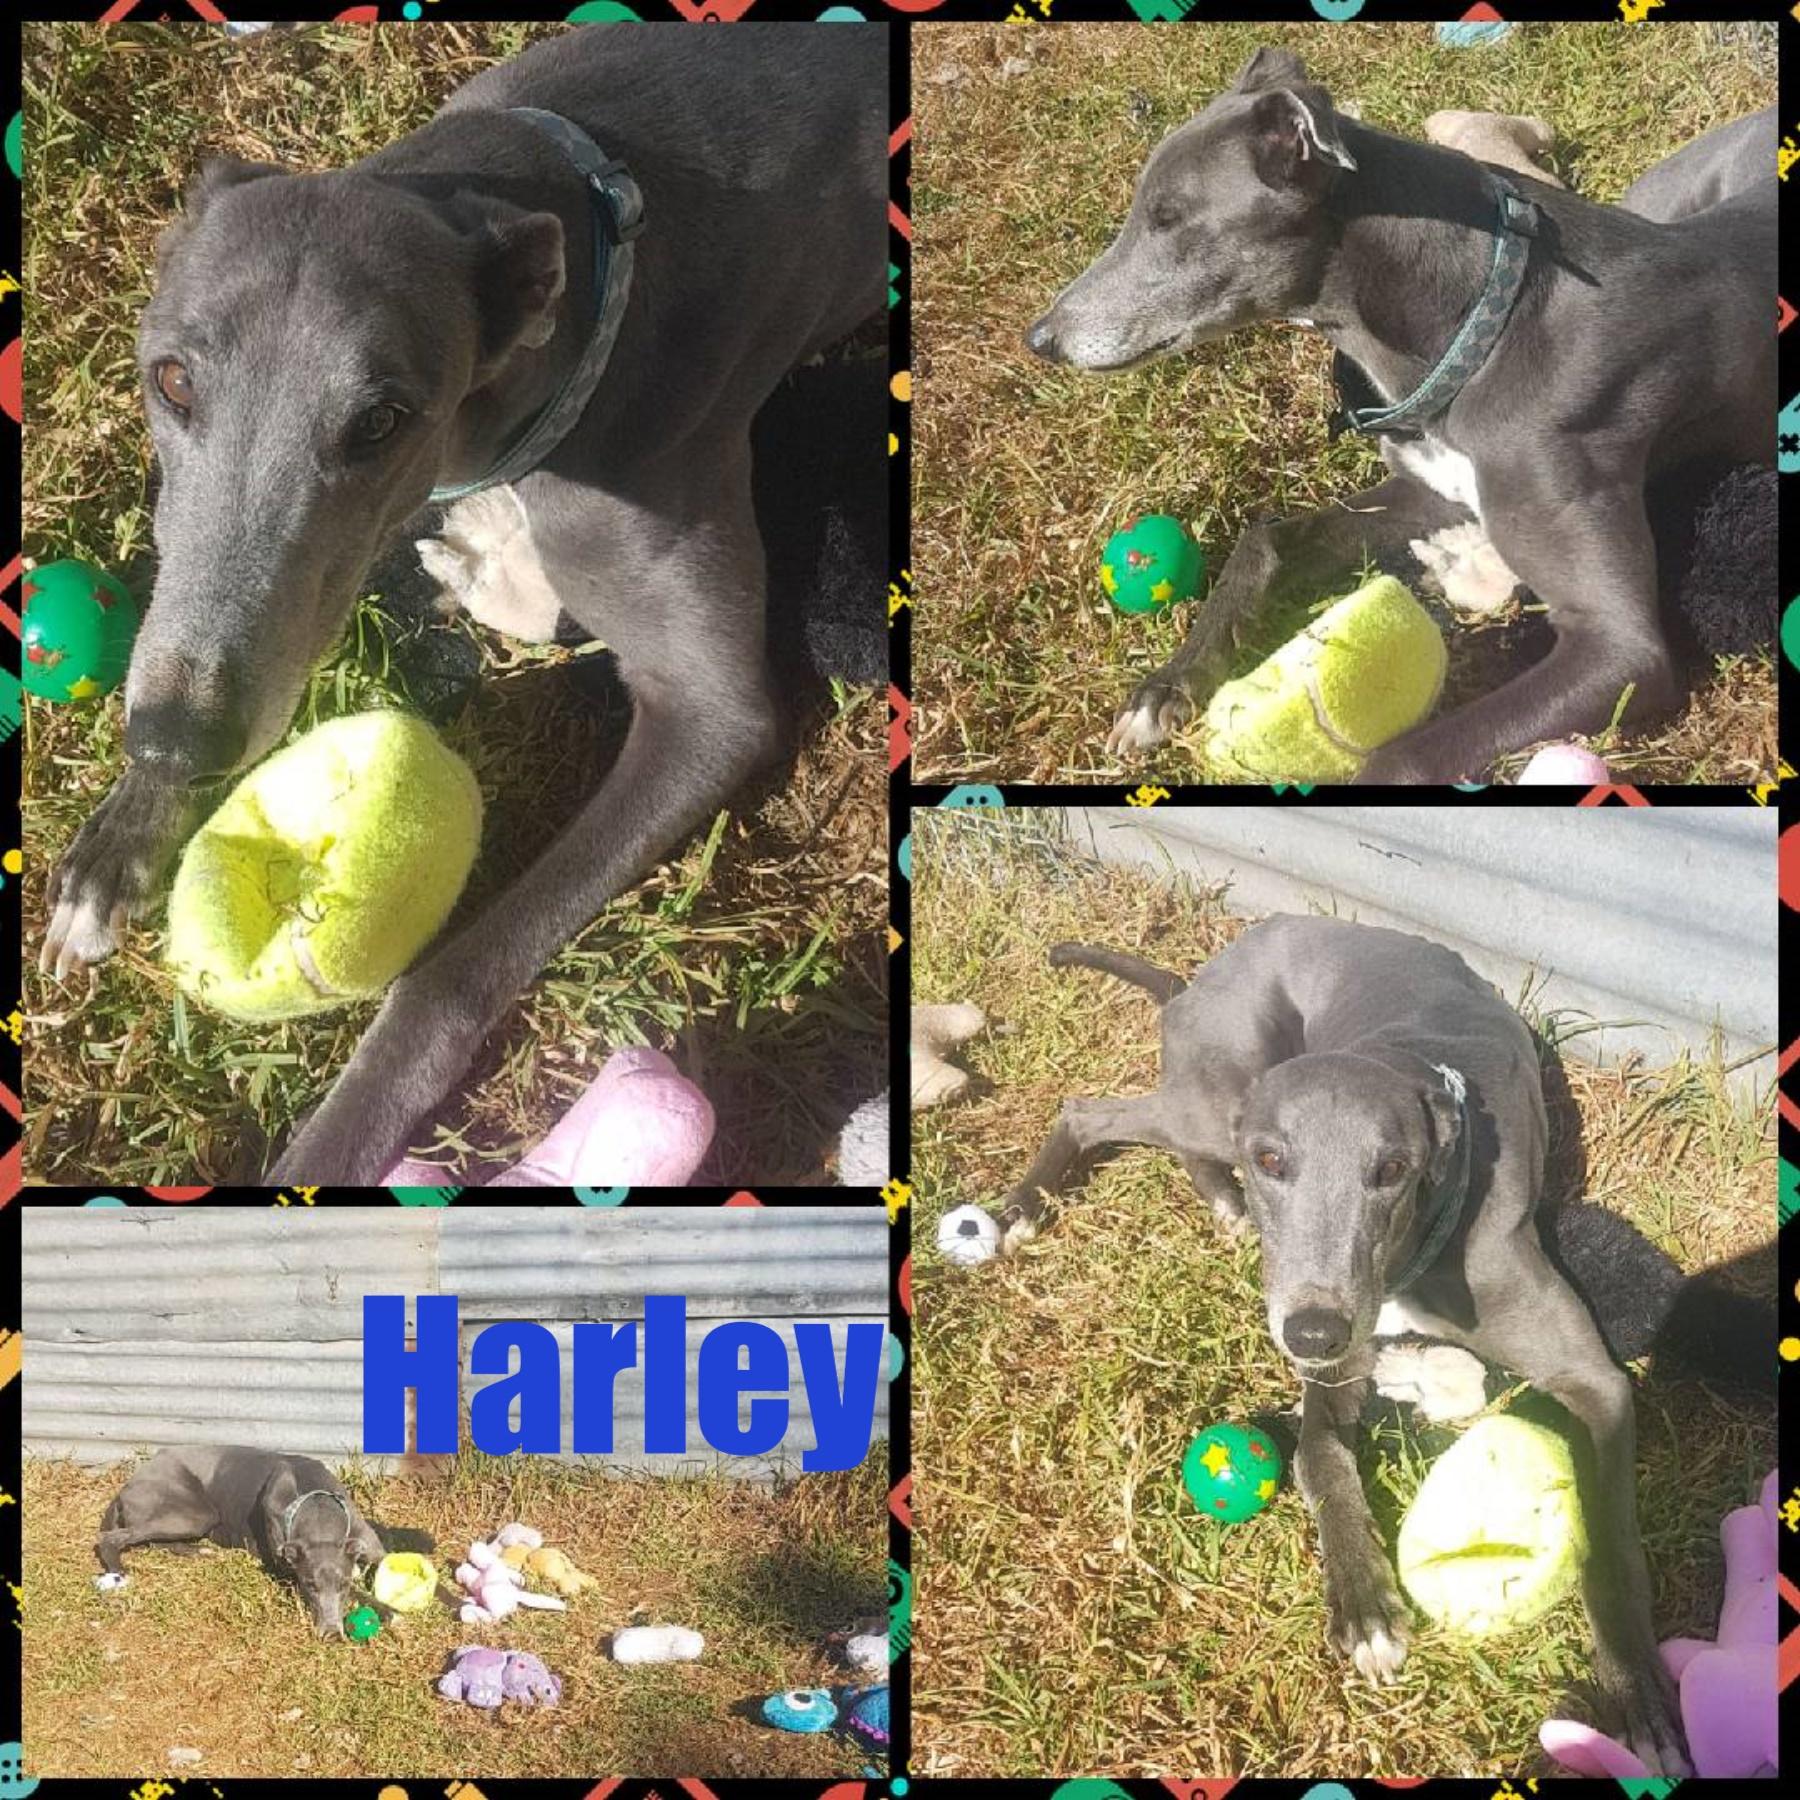 Harley (Interrogated)